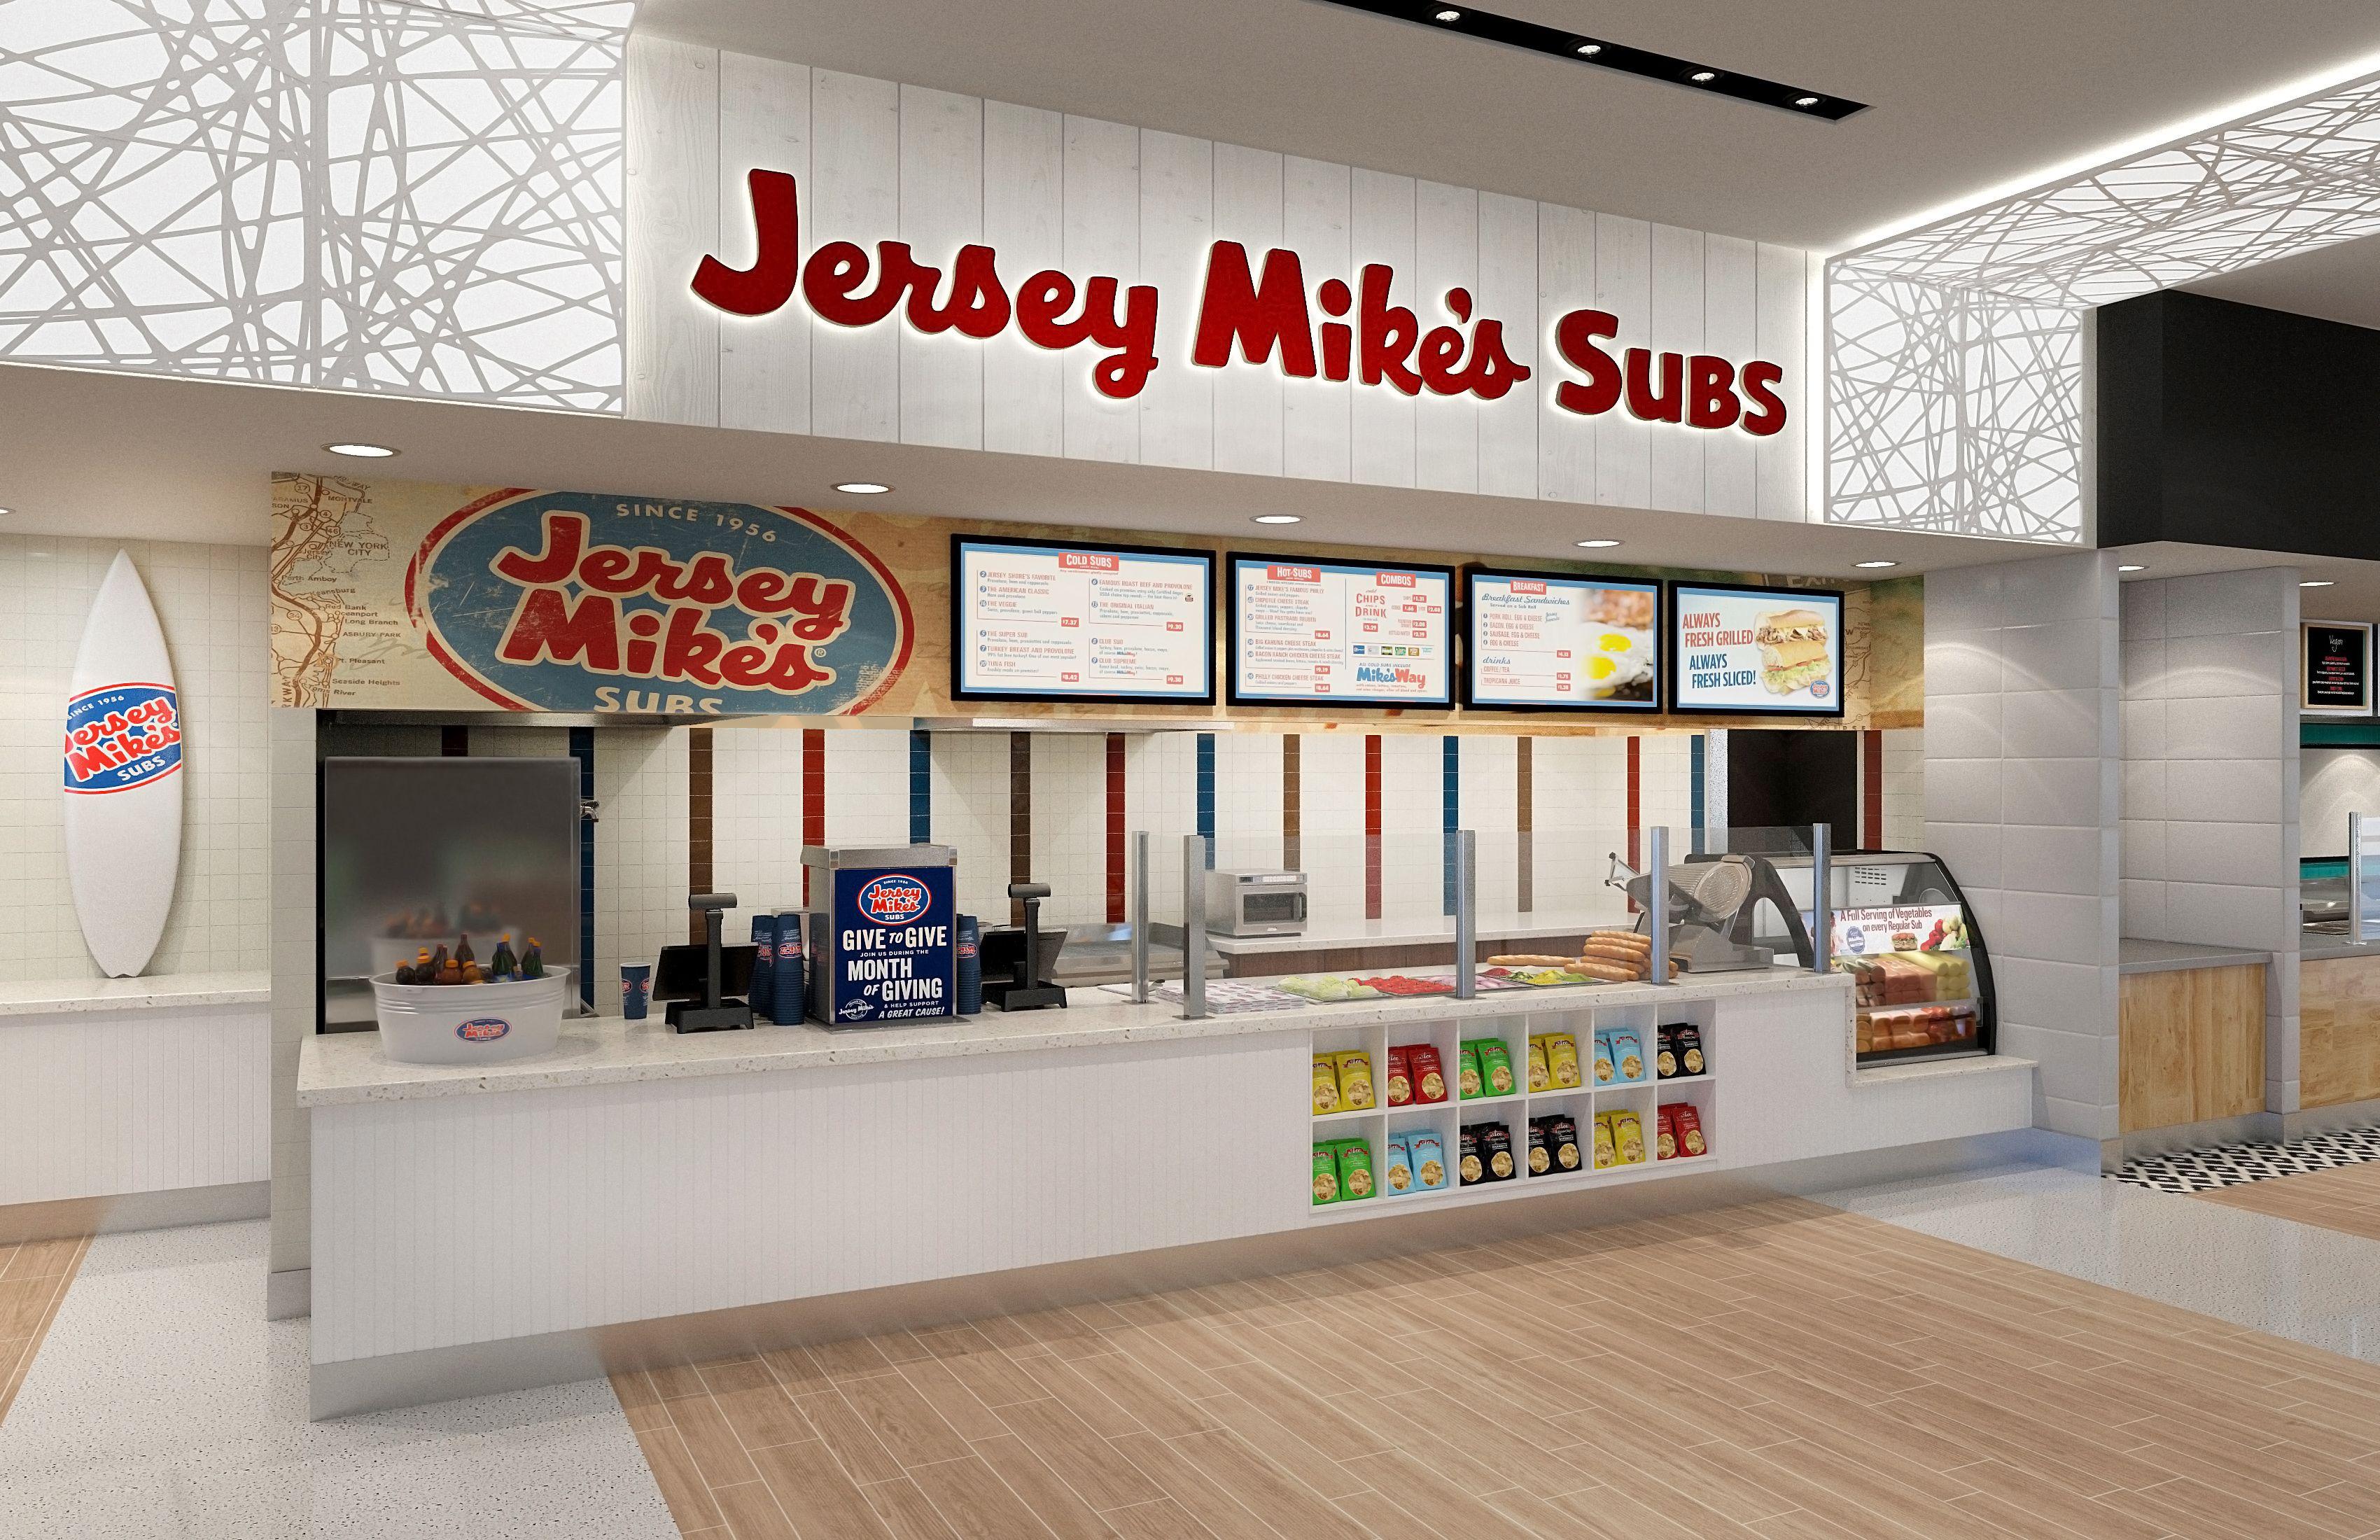 Jersey mikes subs phoenix sky harbor terminal 3